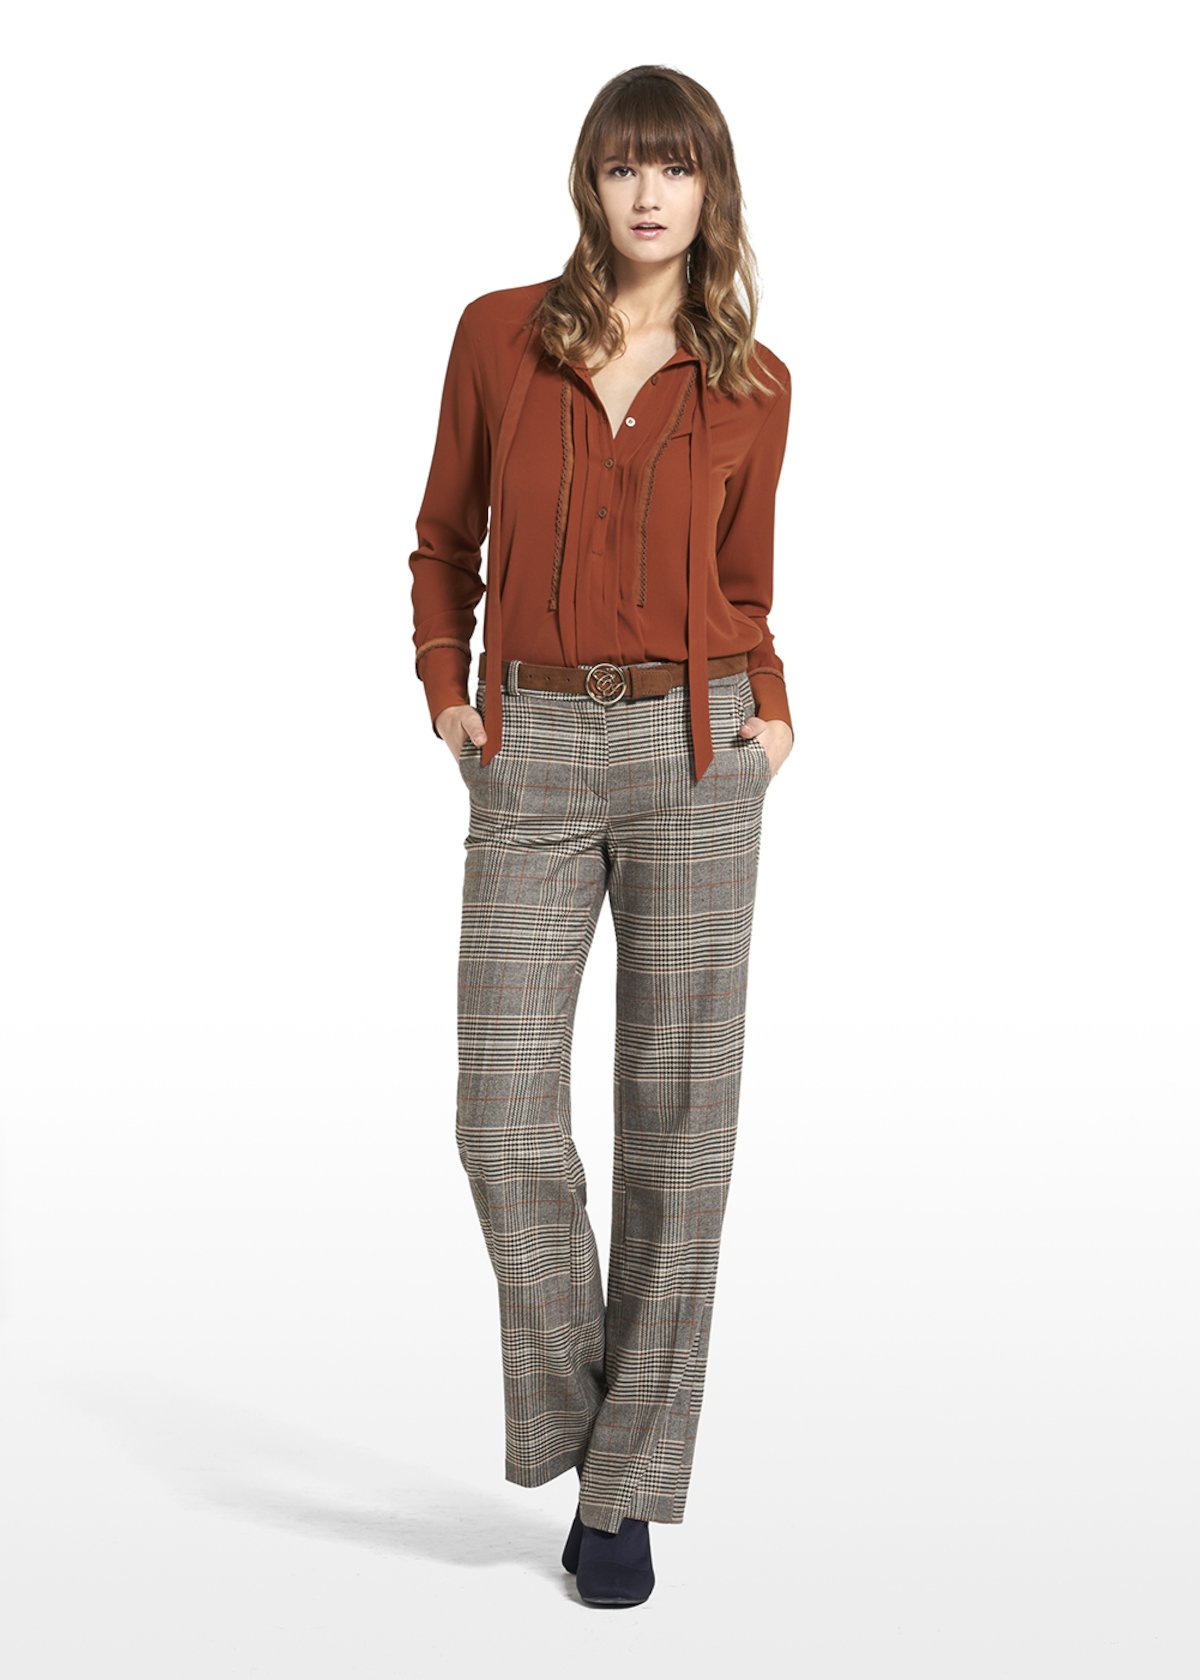 Blouse Camilla in click fabric with scarf neckline - Tobacco - Woman